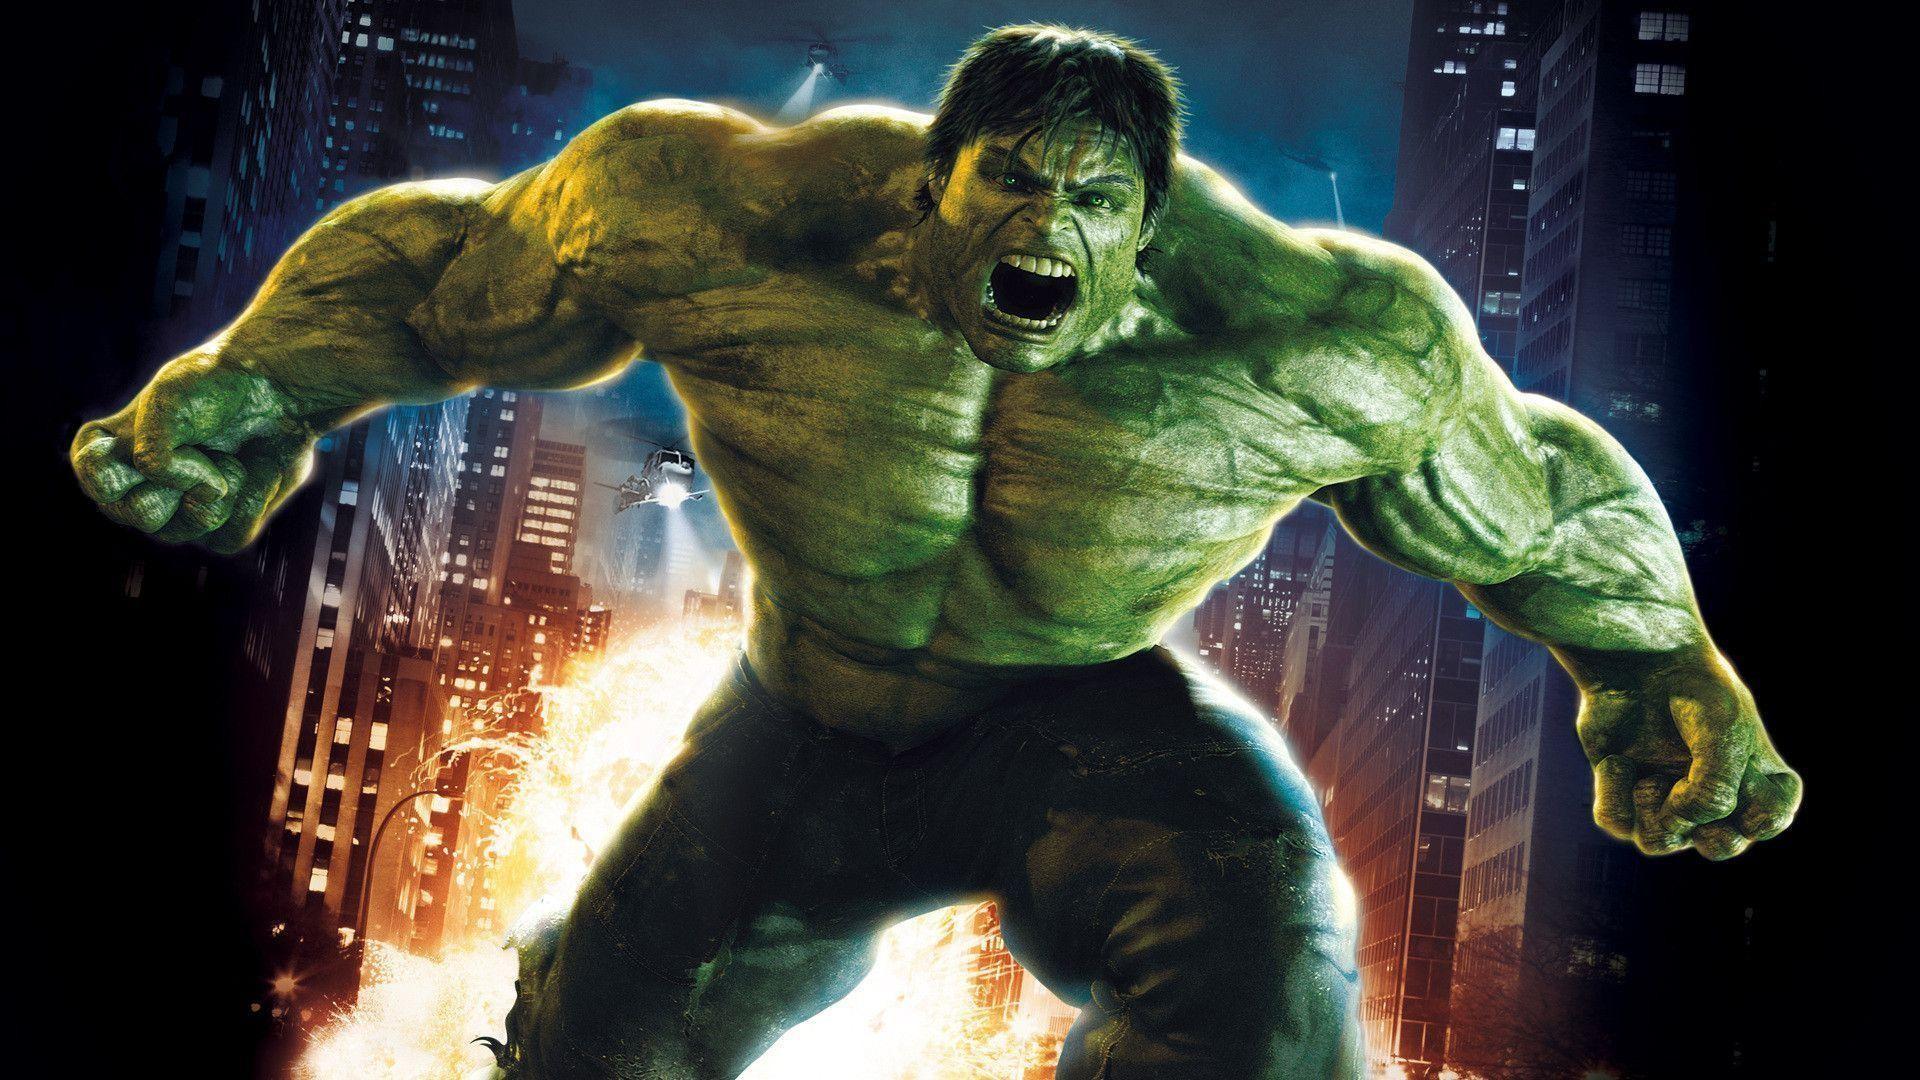 The Incredible Hulk Wallpapers Wallpapertag